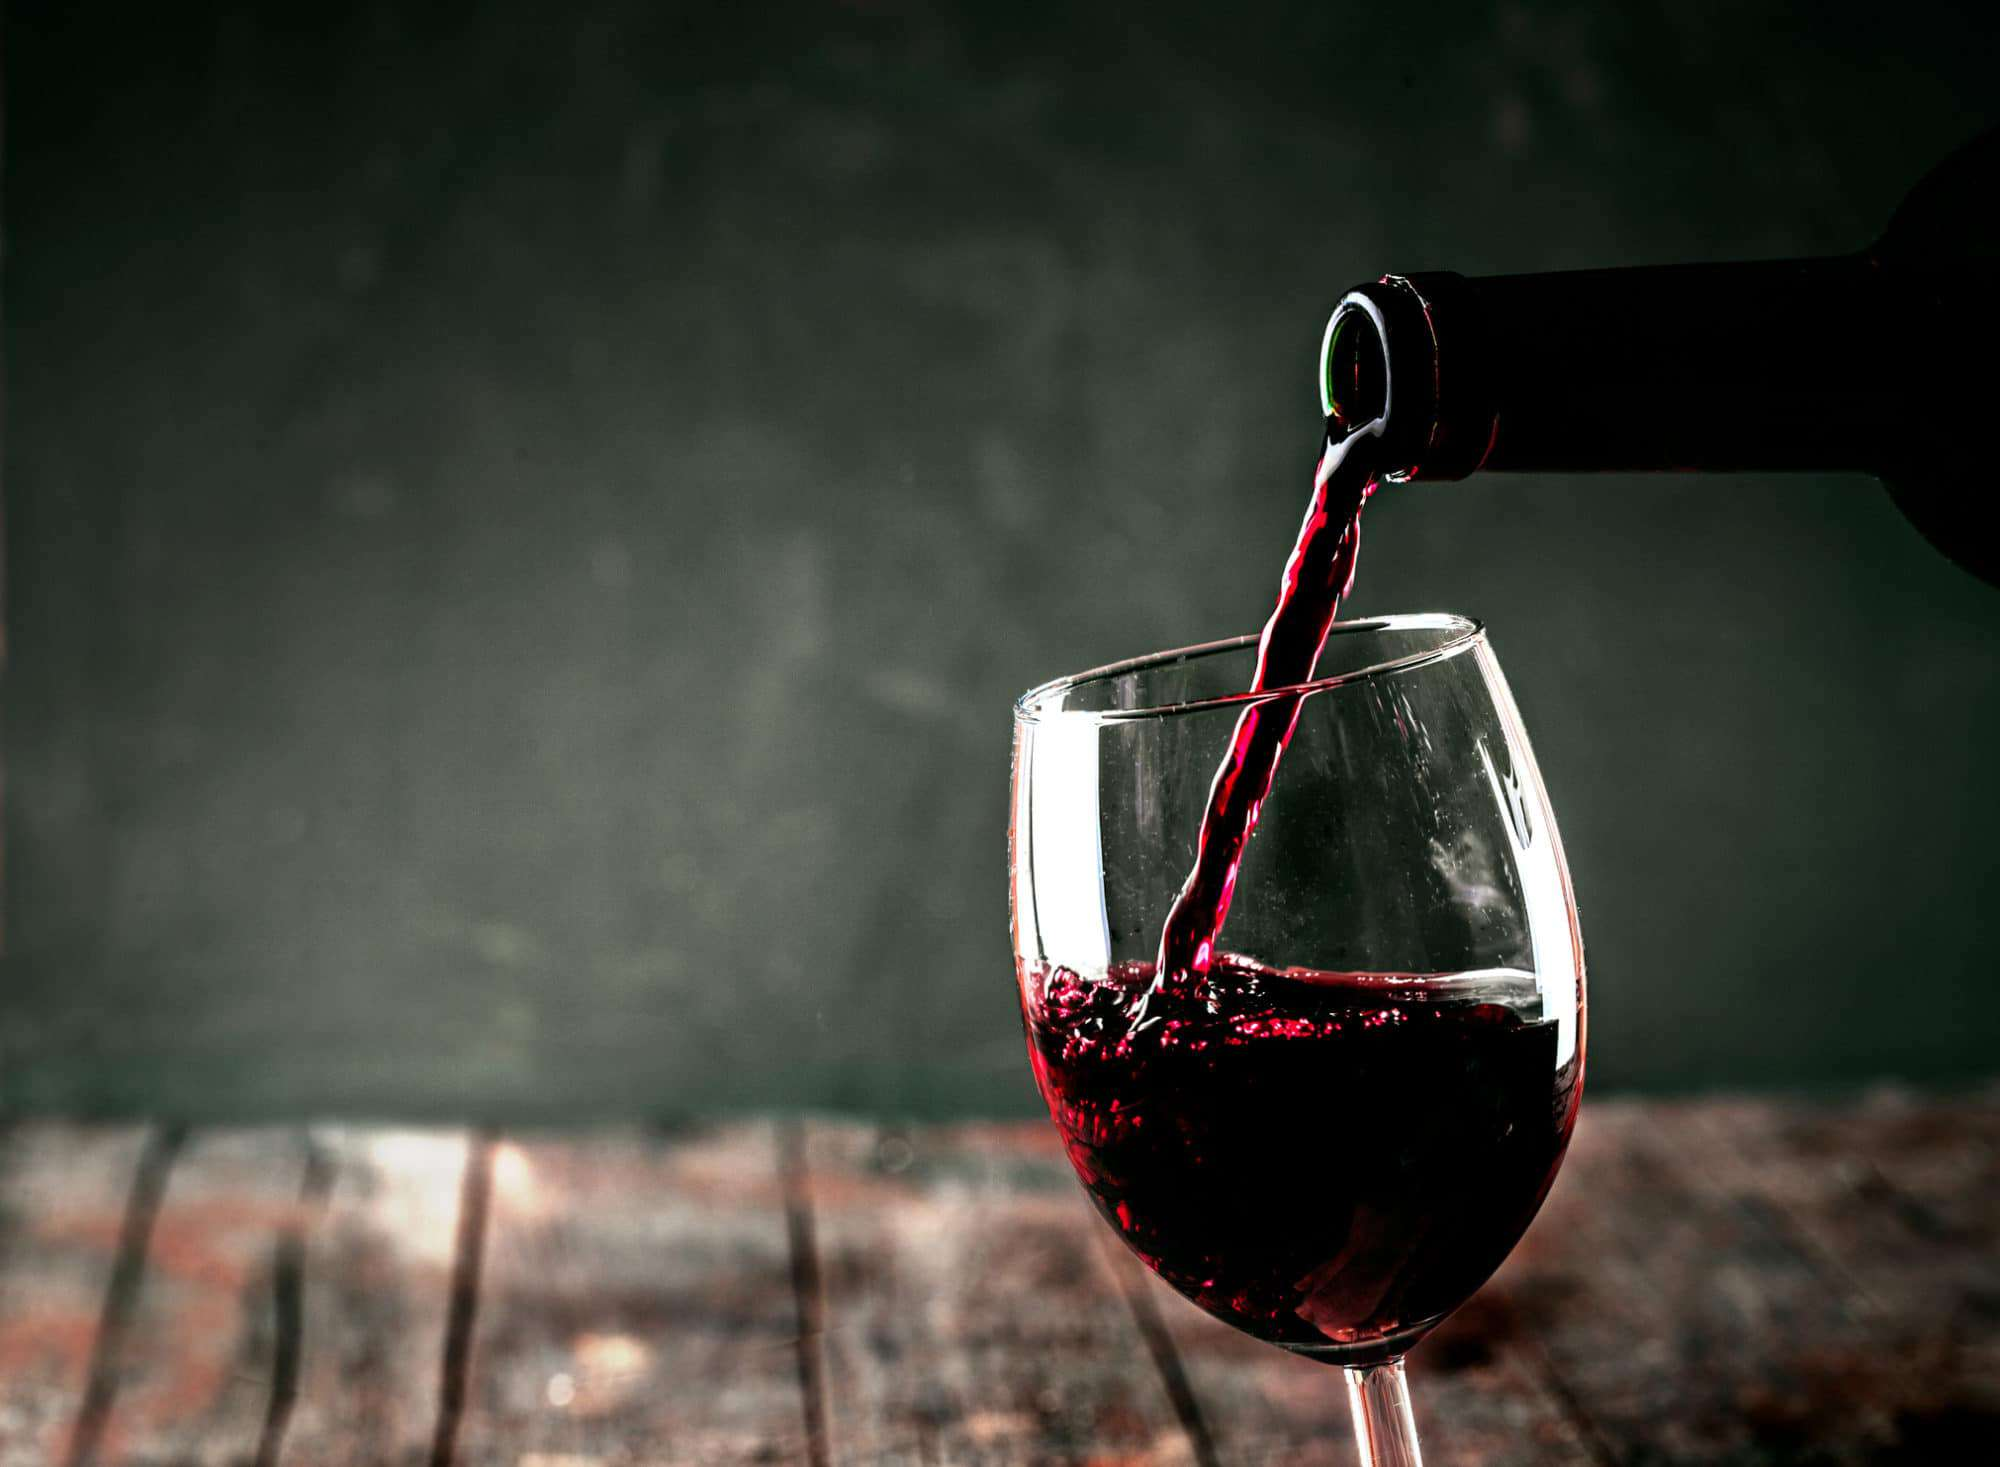 camys suvignon Red wine types